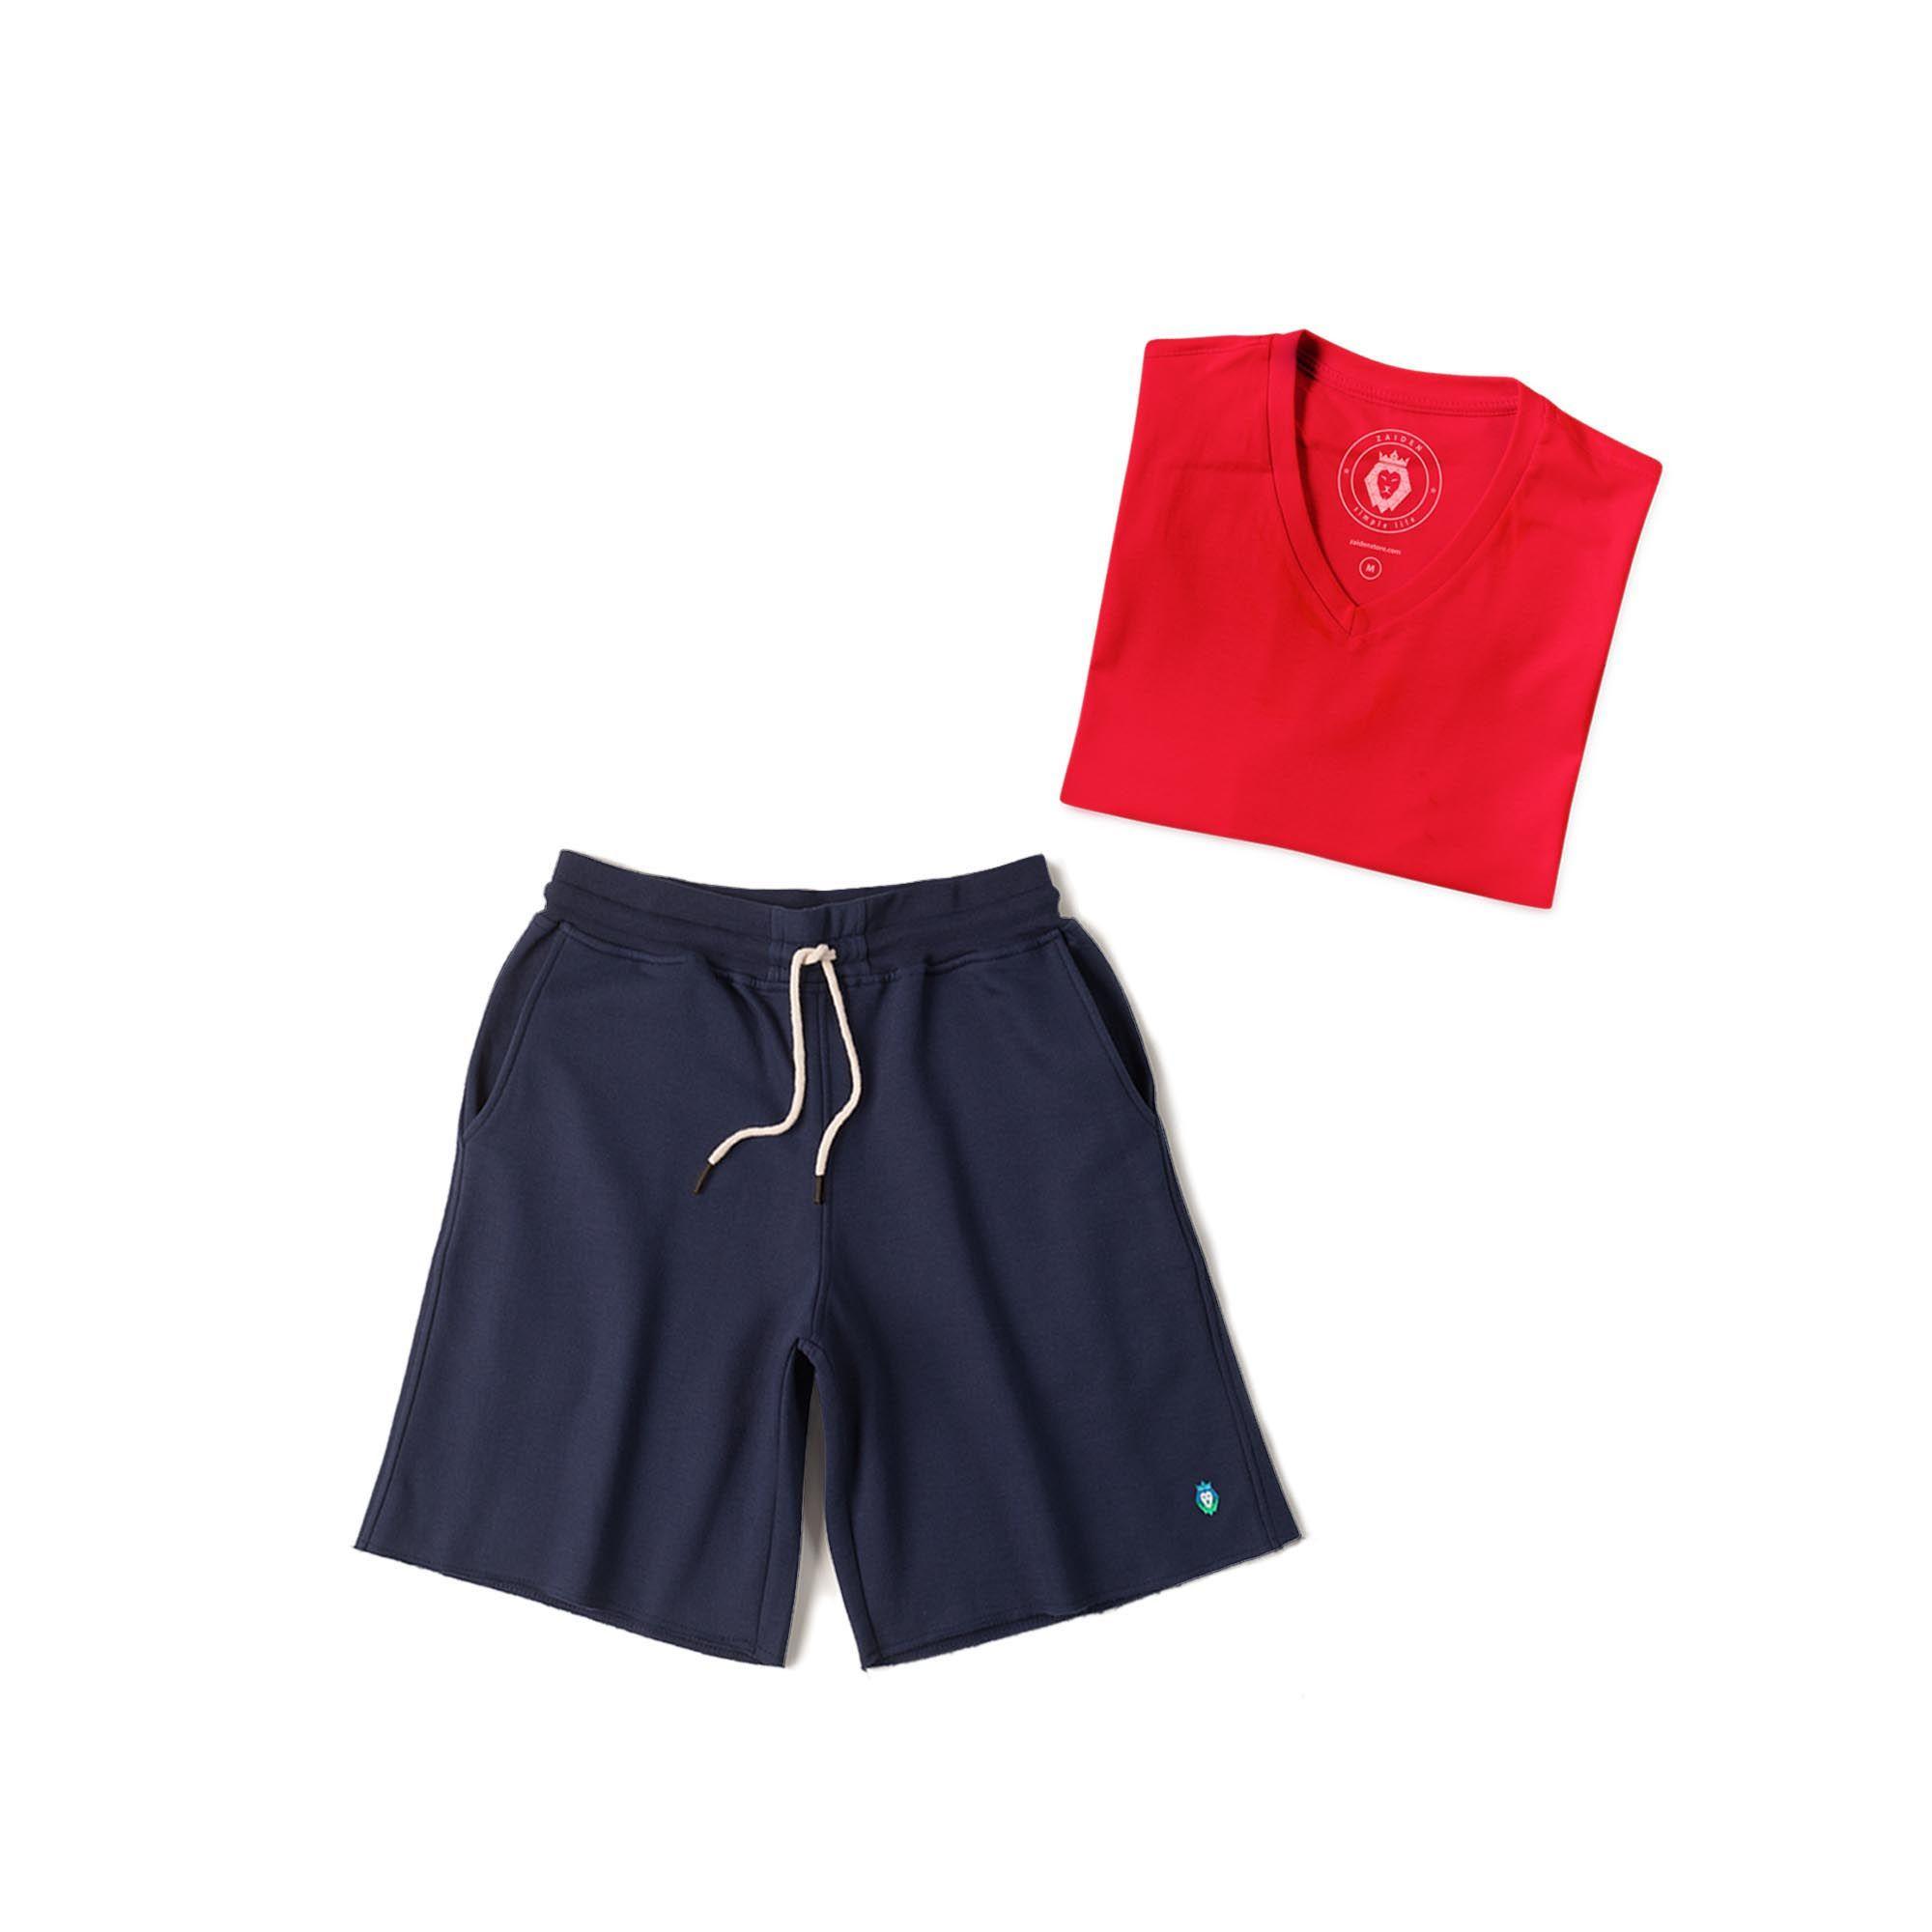 Kit 1 Bermuda Basic Azul Marinho + 1 T-Shirt Basic Vermelha Zaiden Masculina